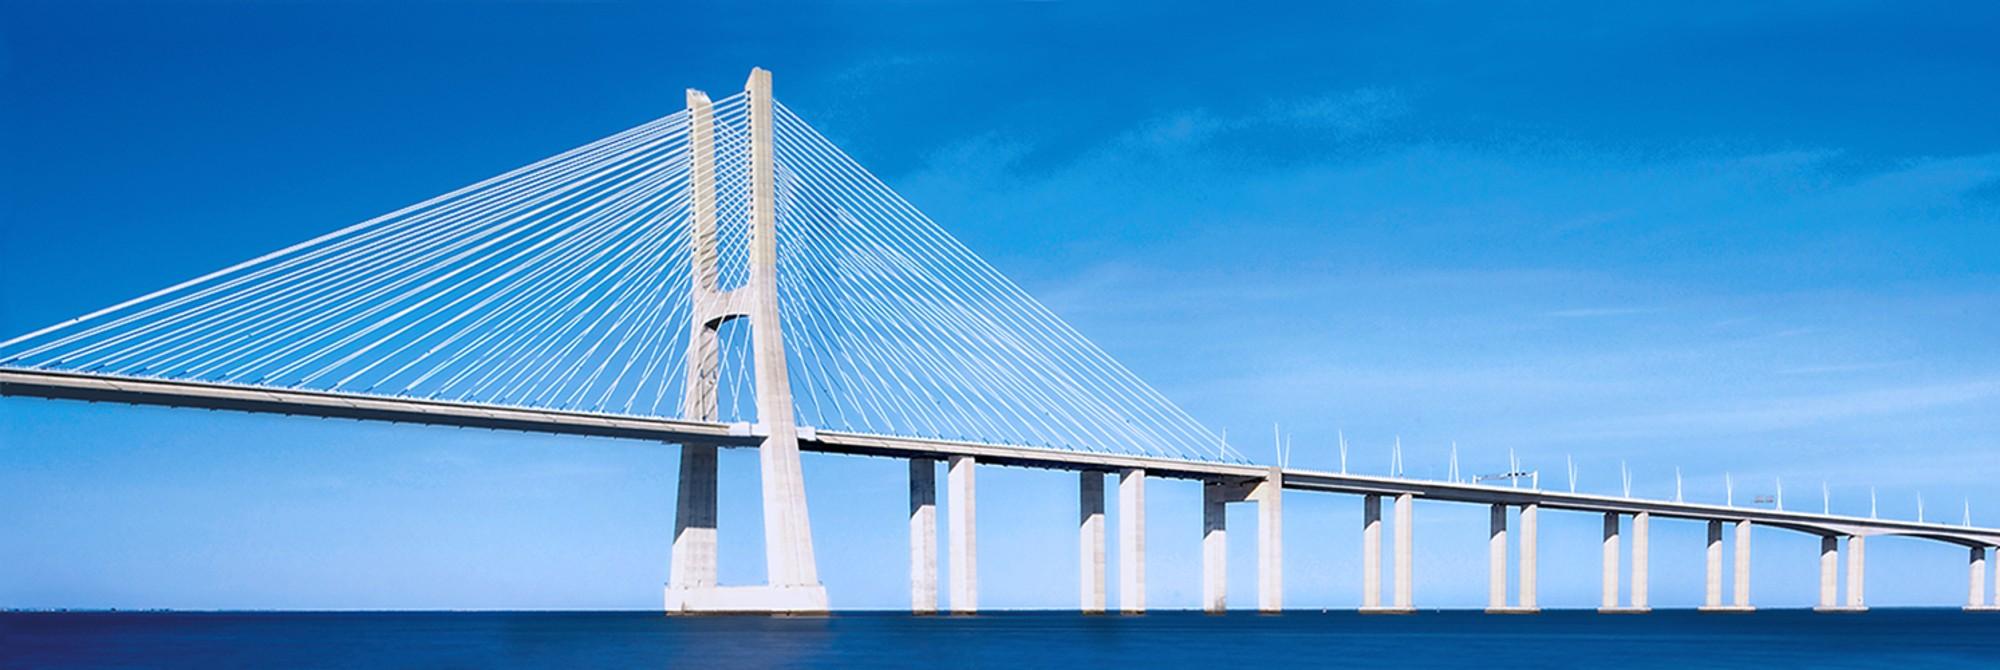 thyssenkrupp Compliance bridge key visual